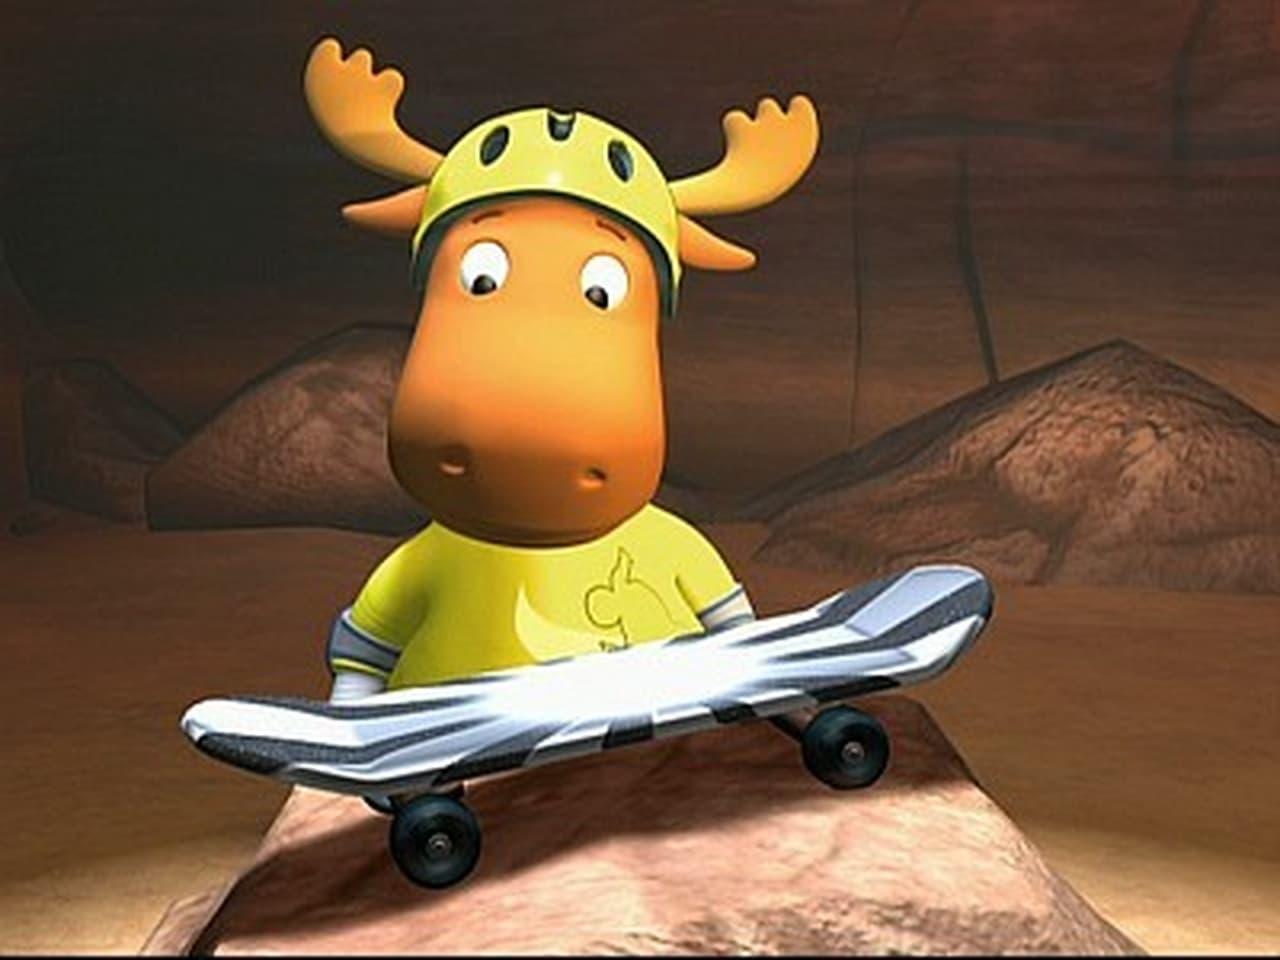 The Backyardigans Episode: Elephant on the Run